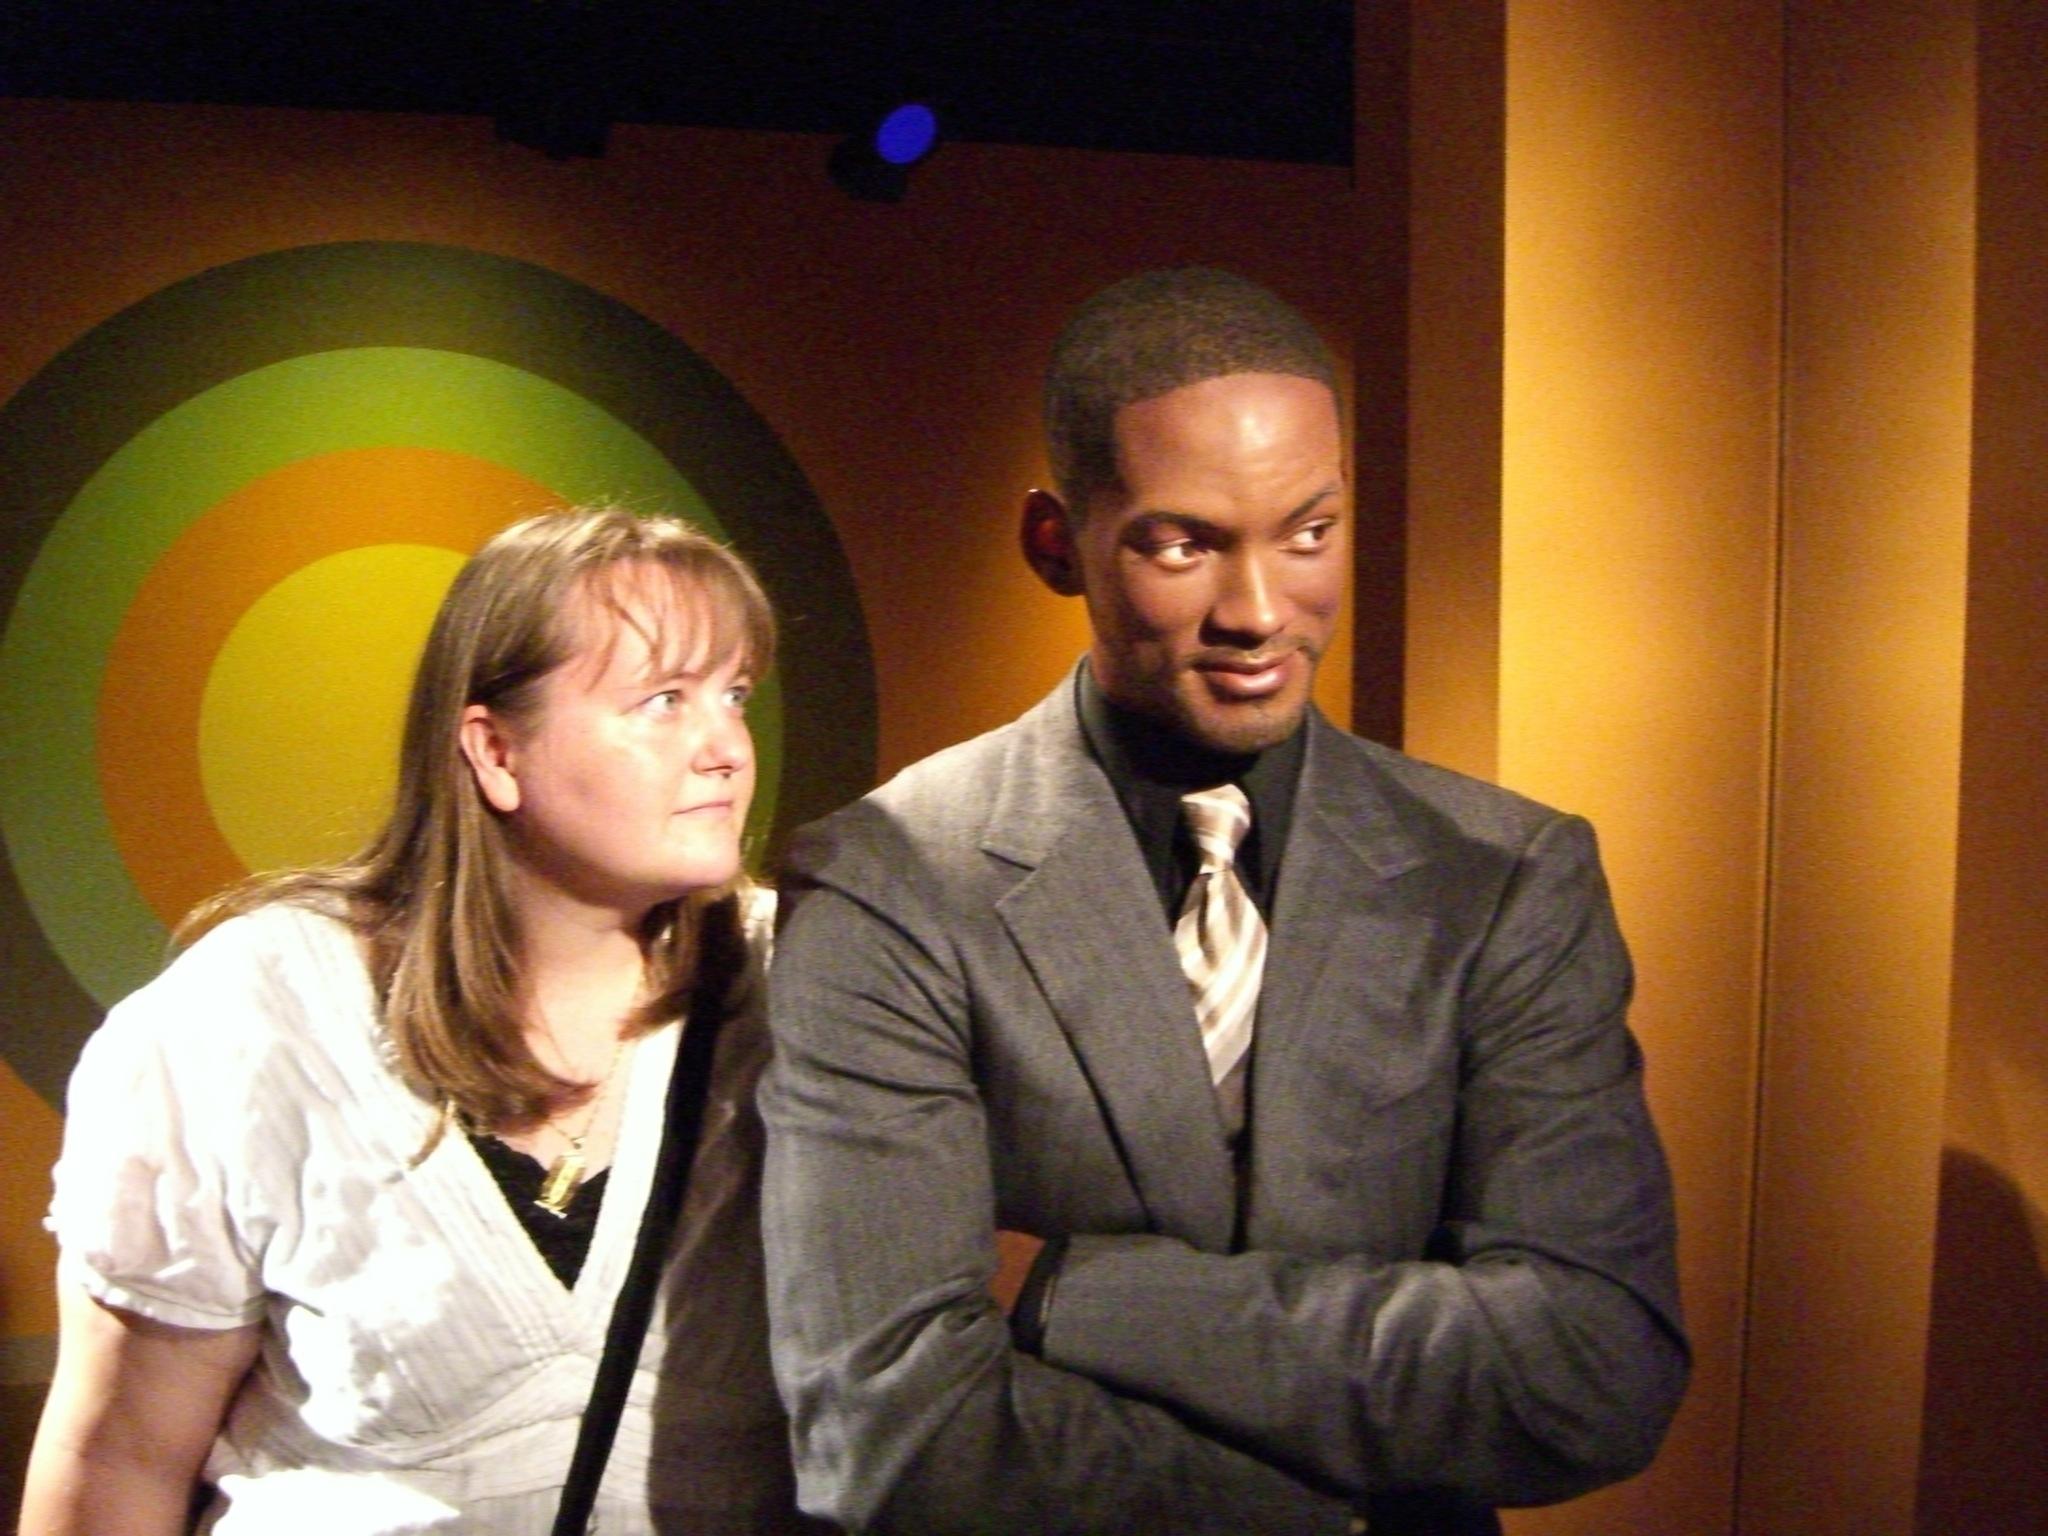 File:Gazing adoringly at Will Smith.jpg